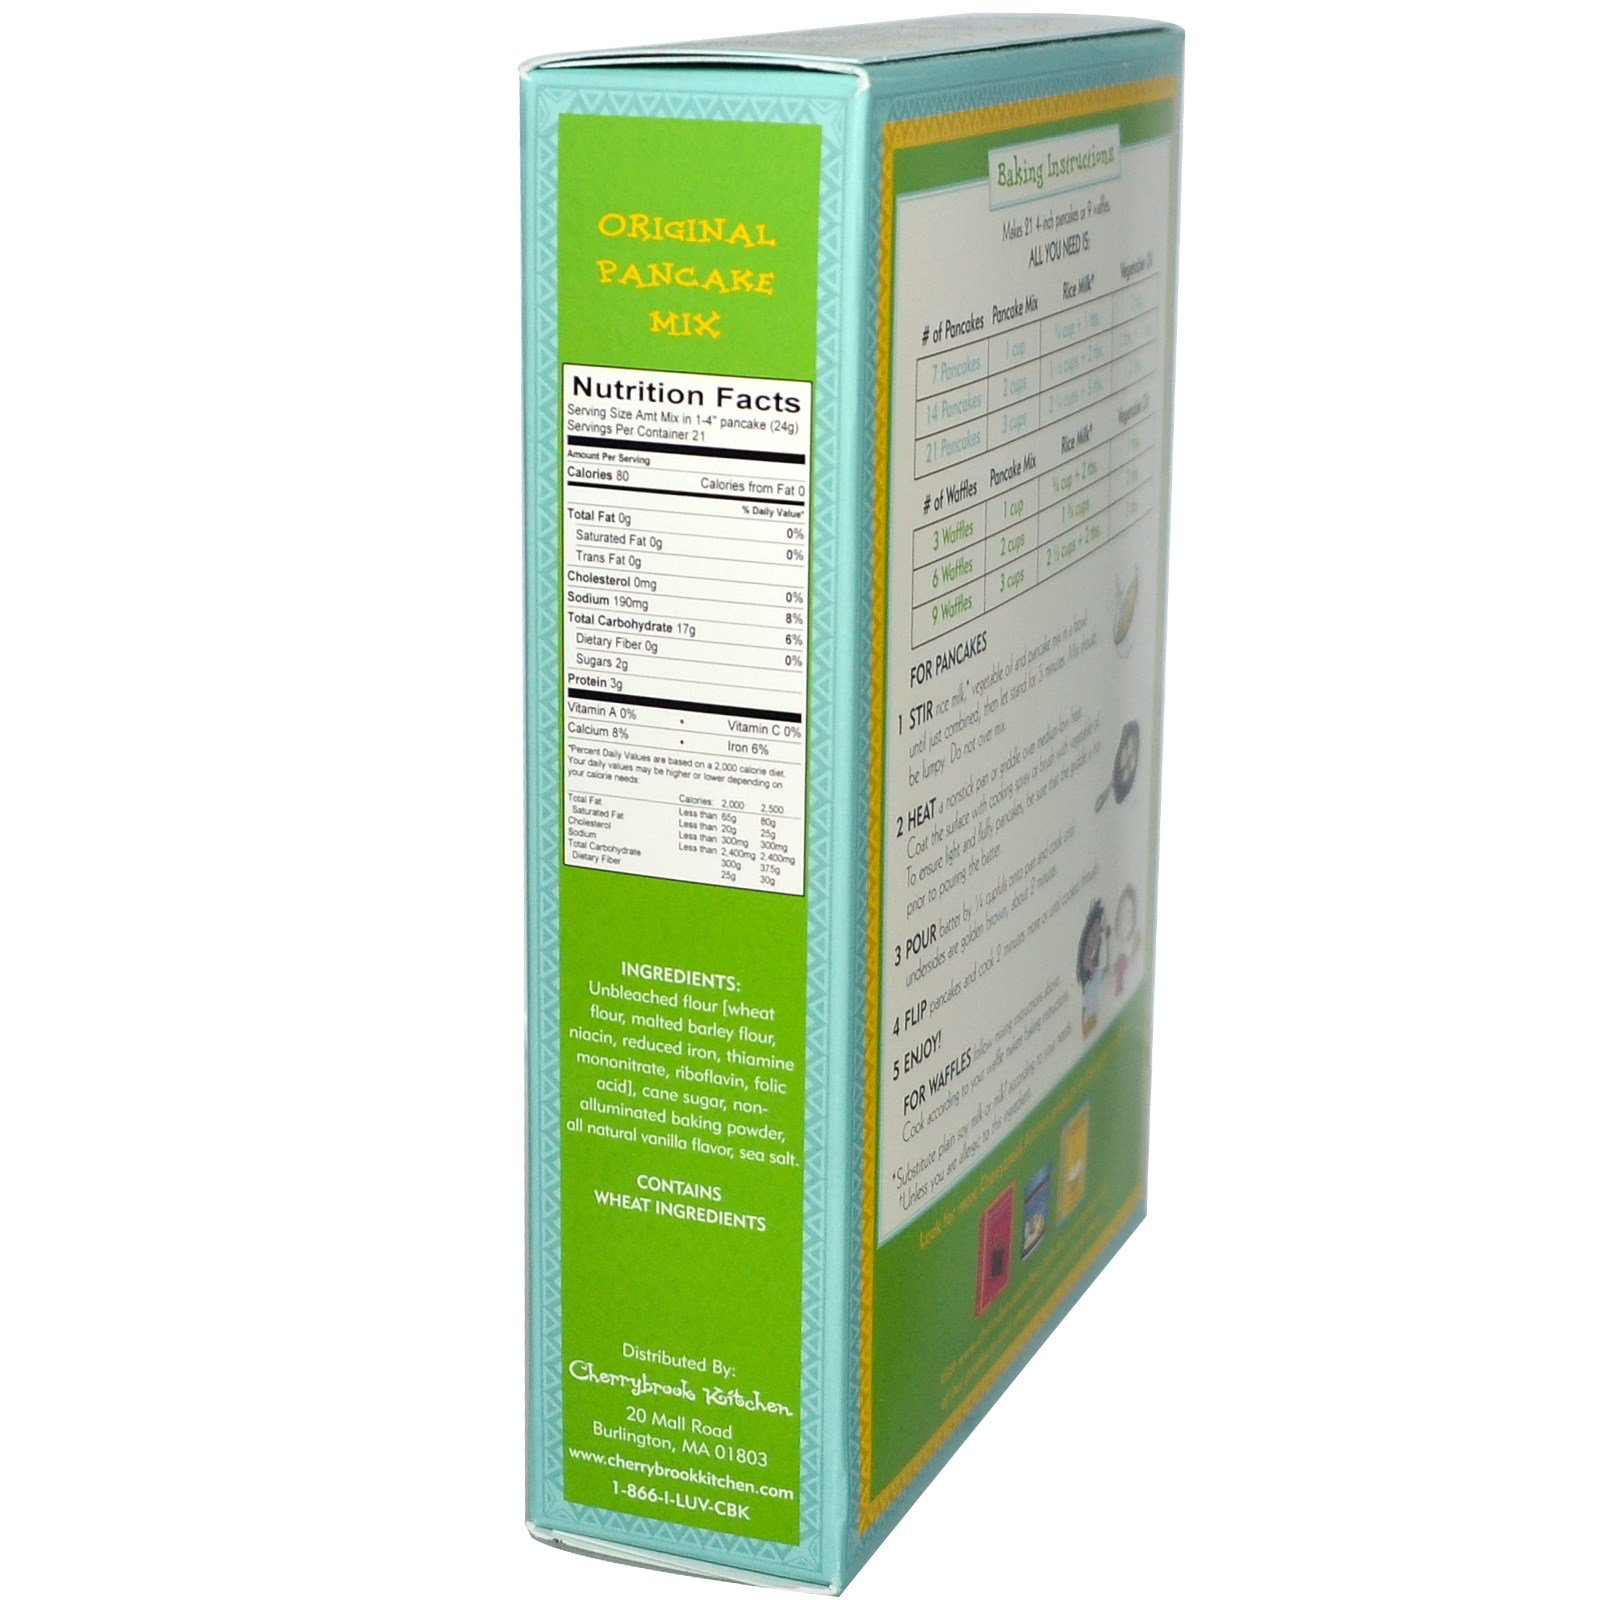 Cherrybrook Kitchen, Original Pancake Mix, 18.5 oz (524 g) - iHerb.com